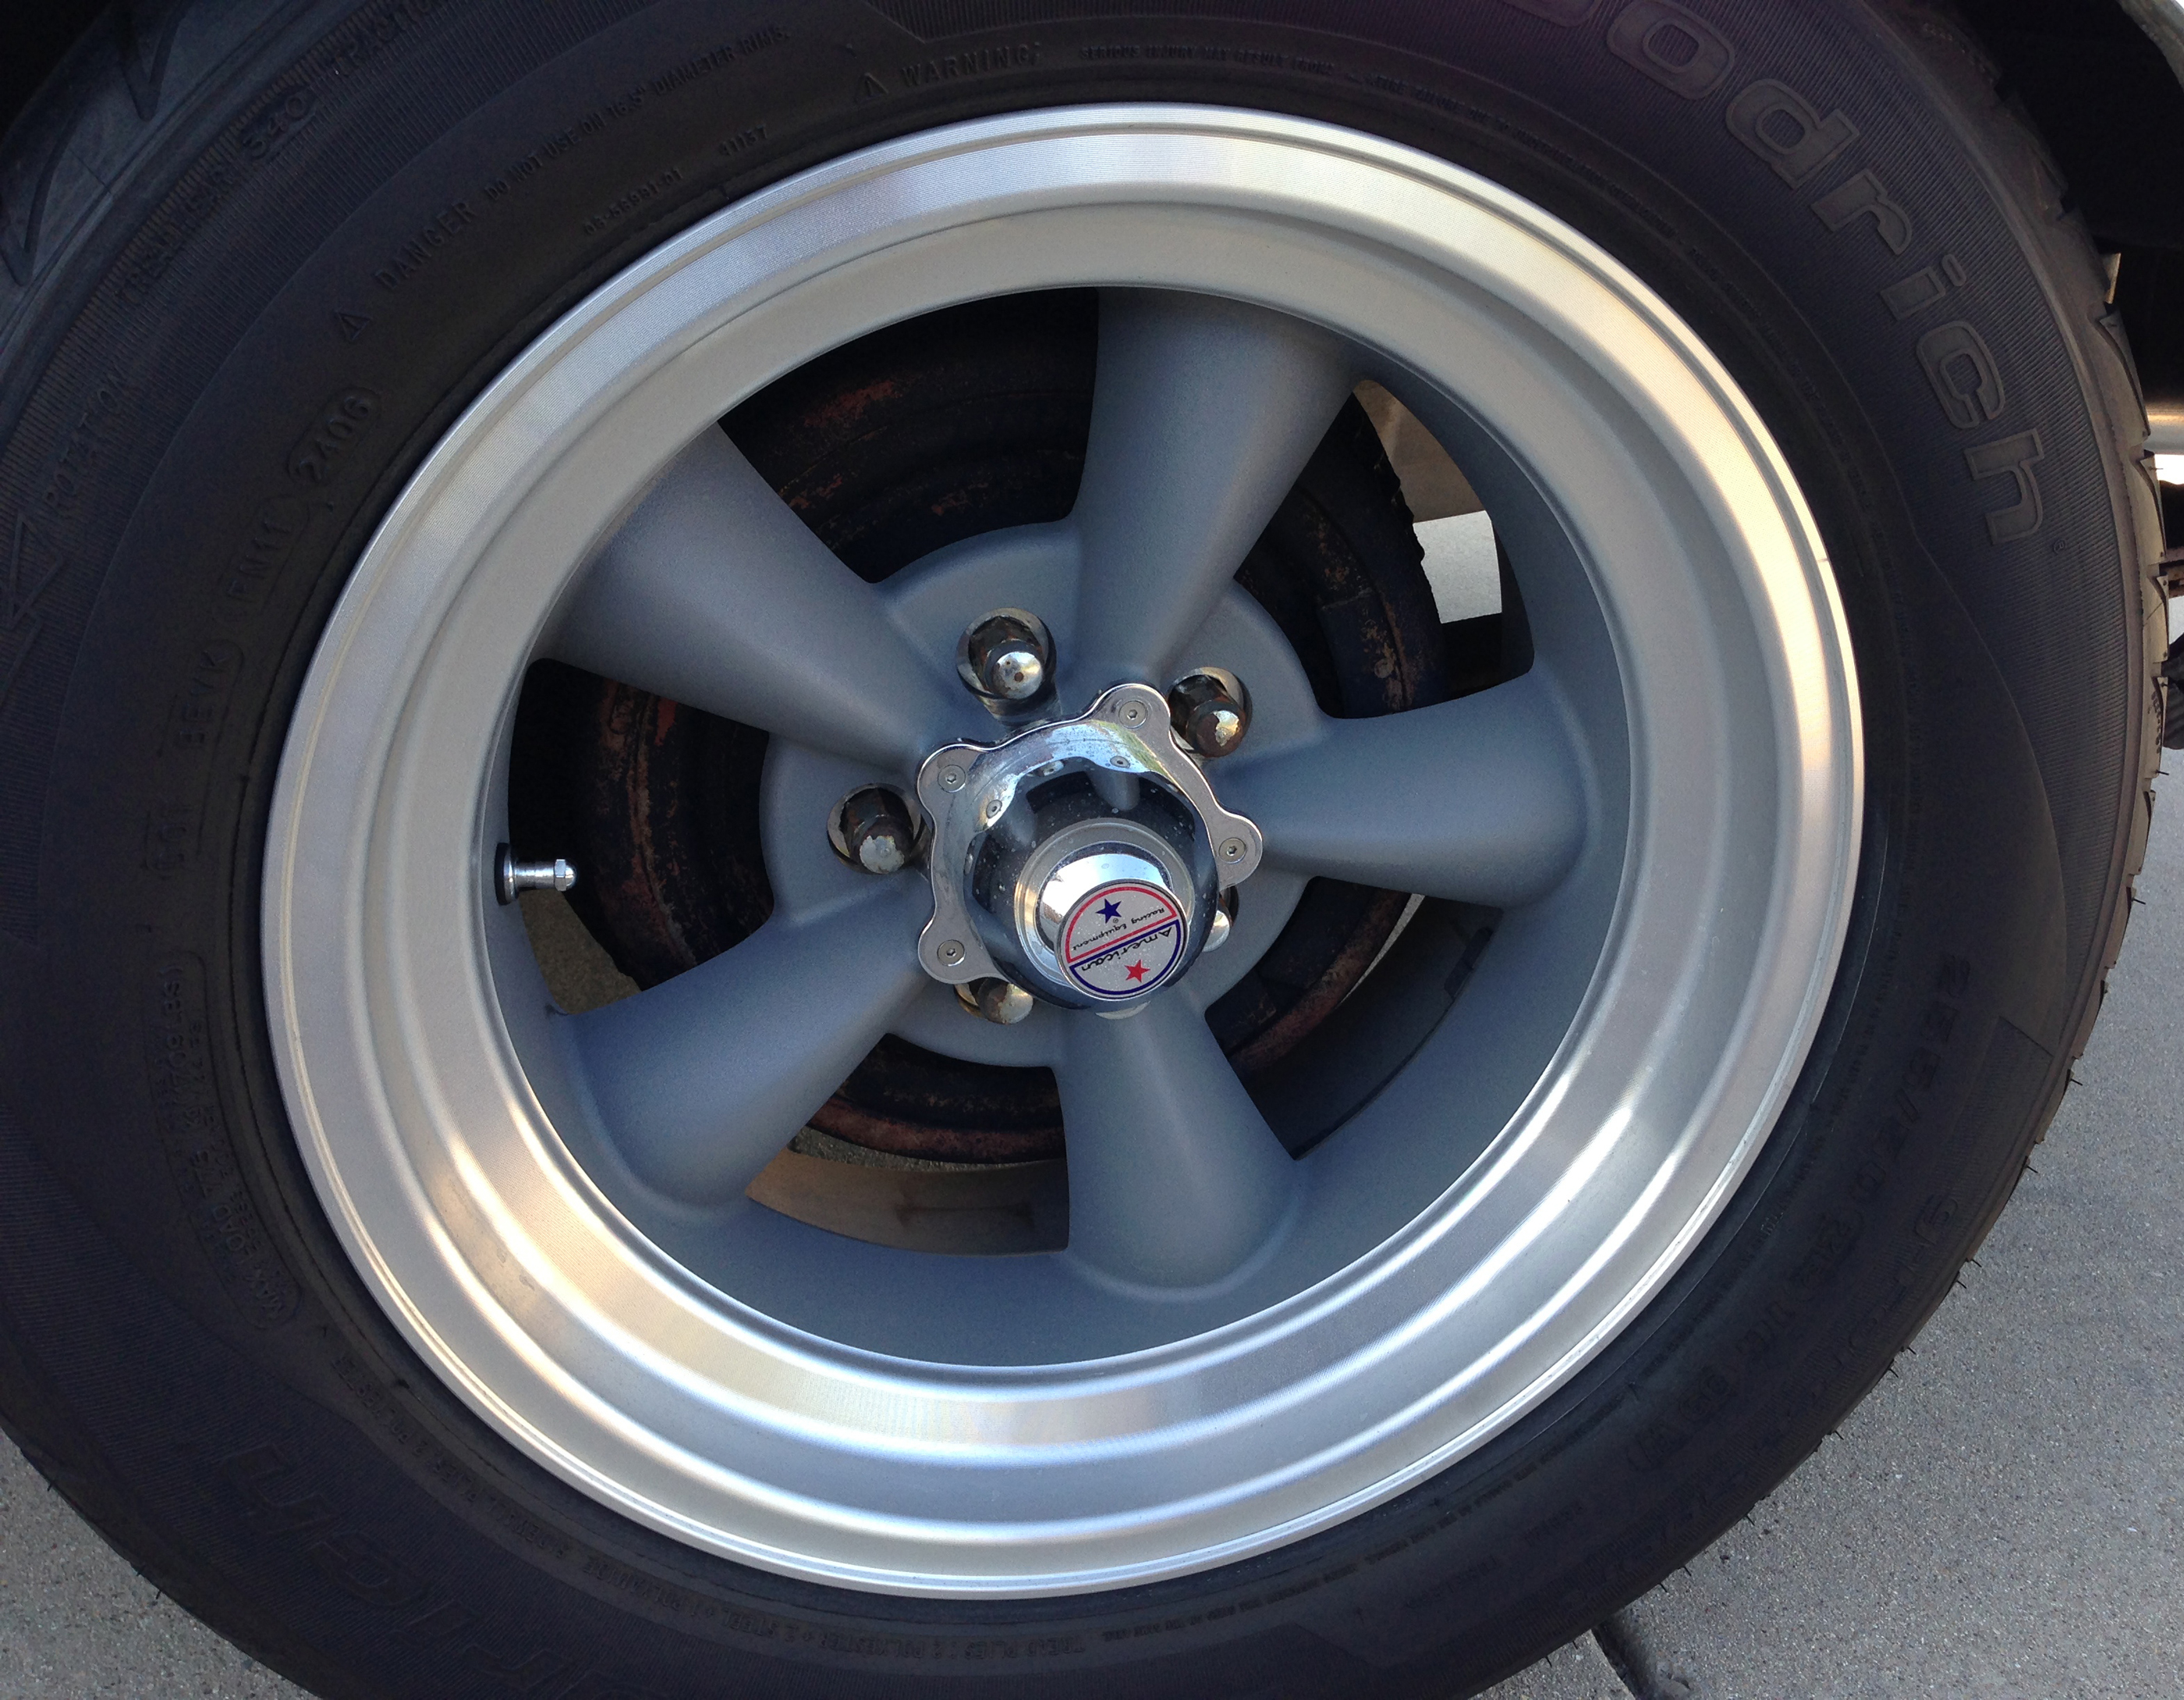 1970 Dodge Challenger RT Tire